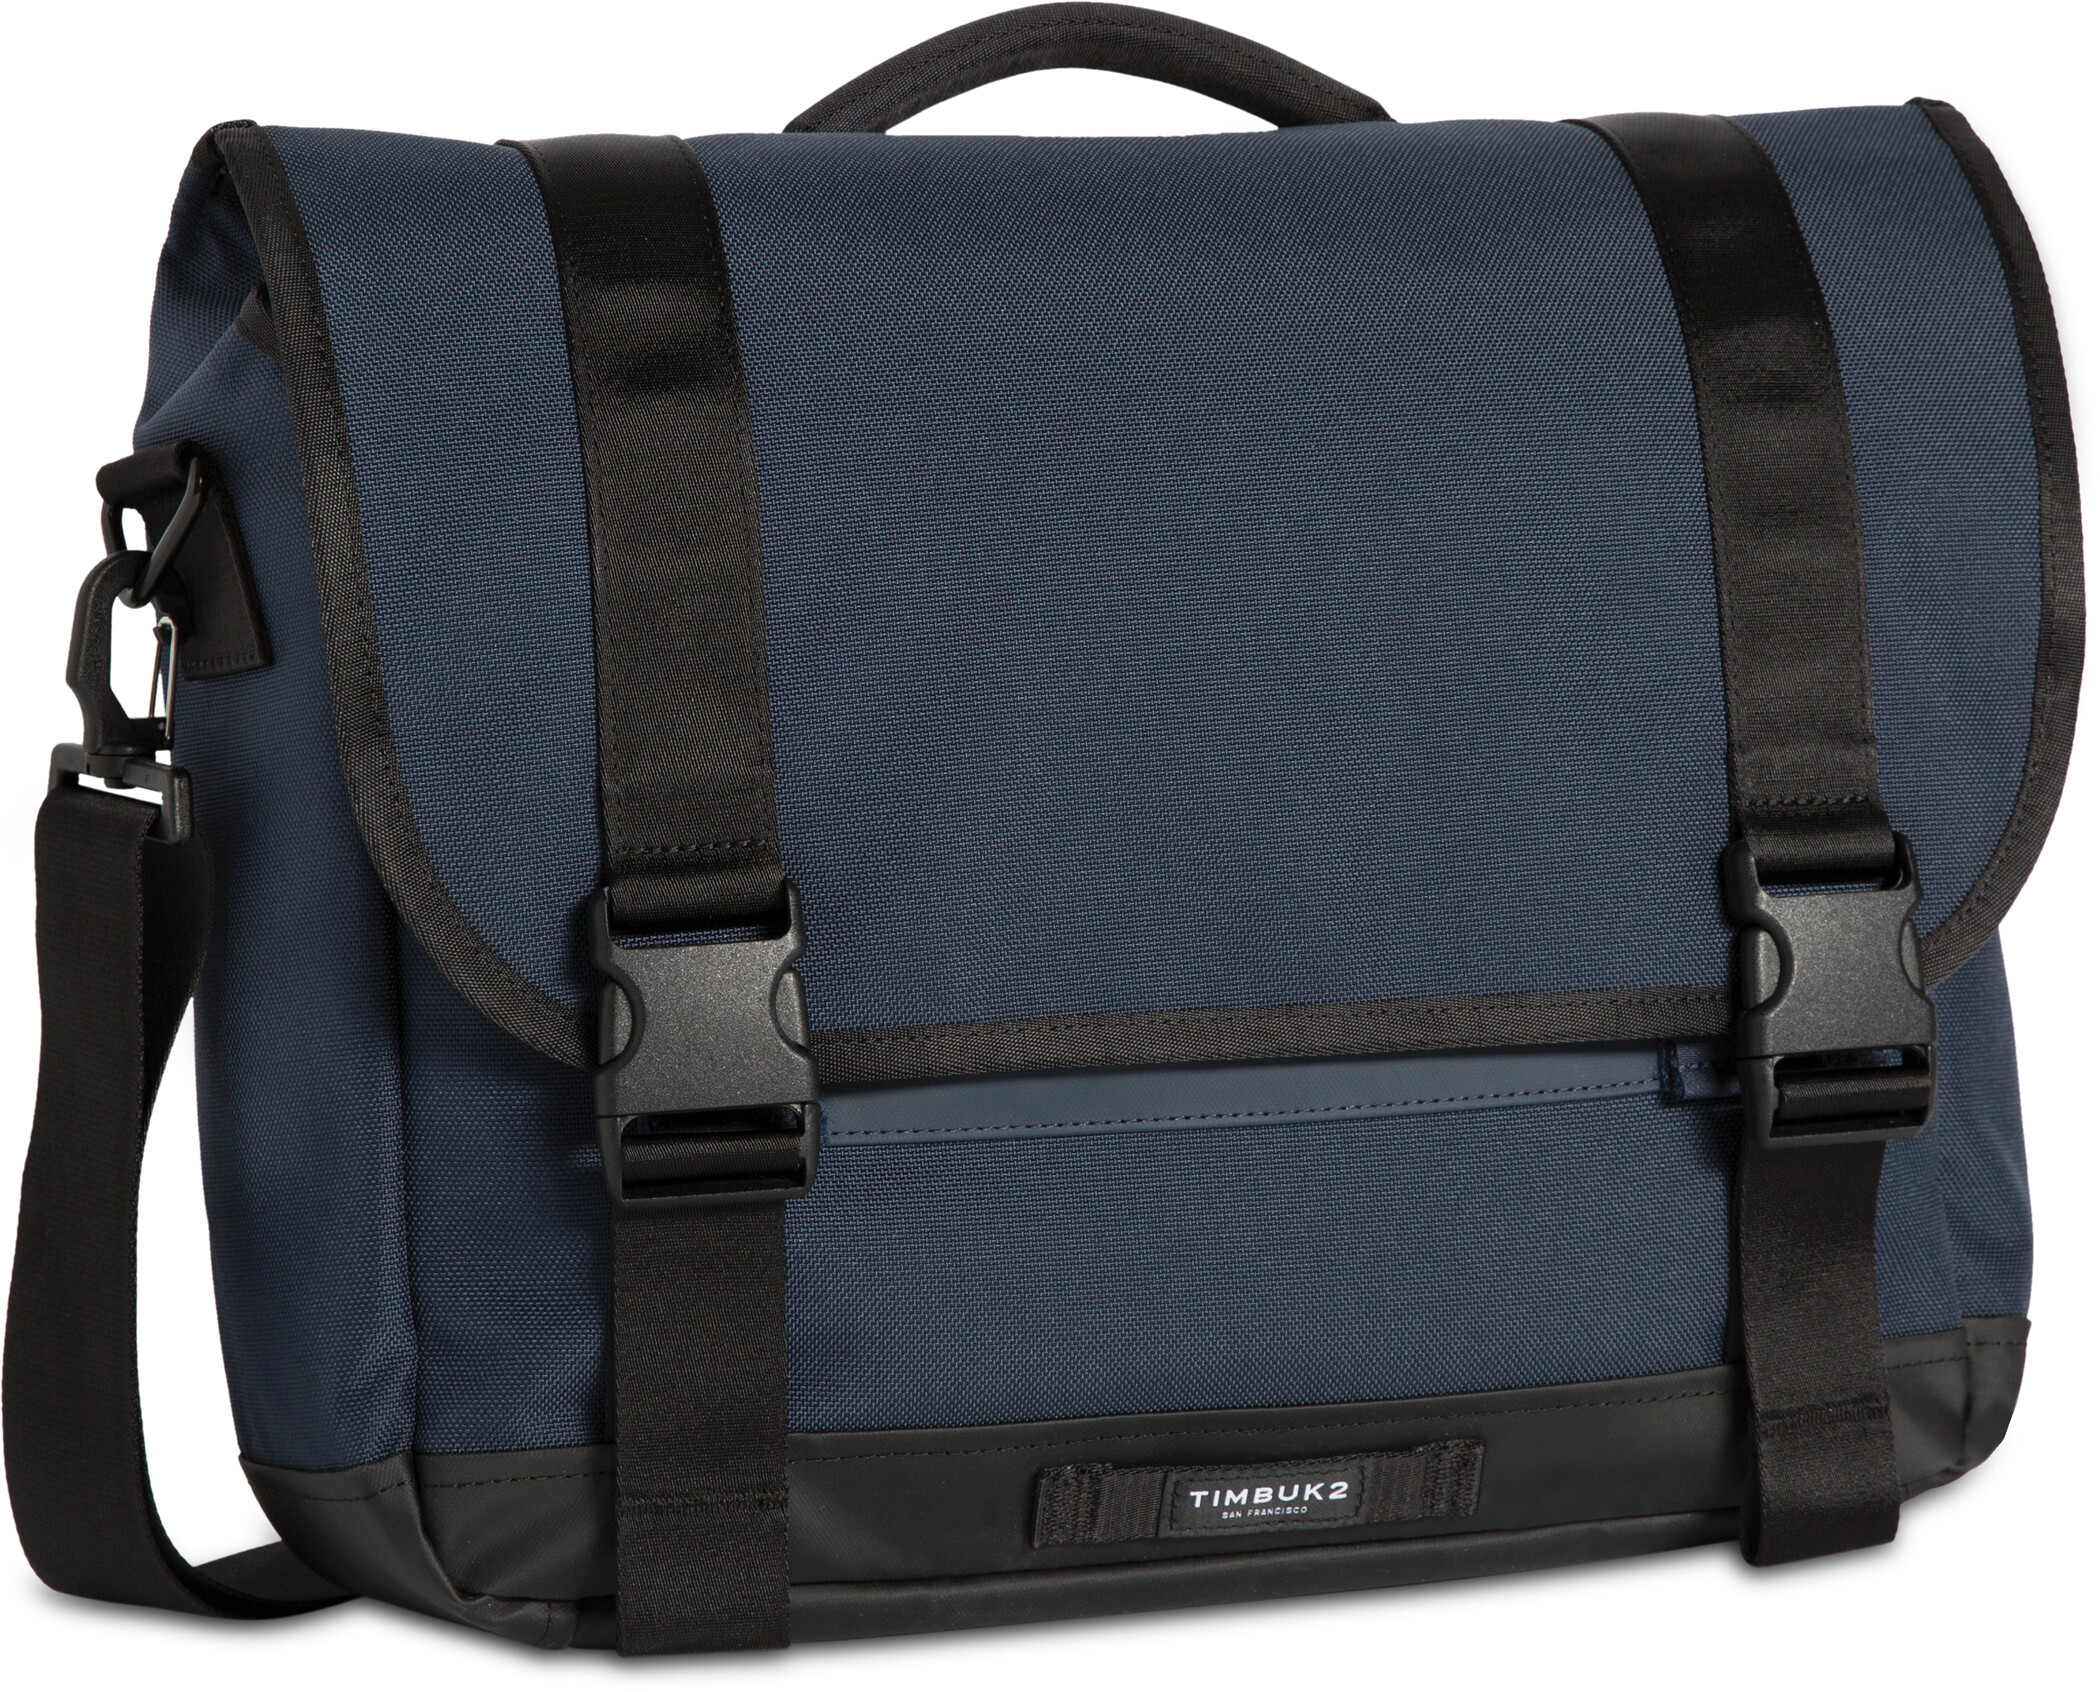 Timbuk2 Commute Messenger Bag M, nautical (2019) | Travel bags